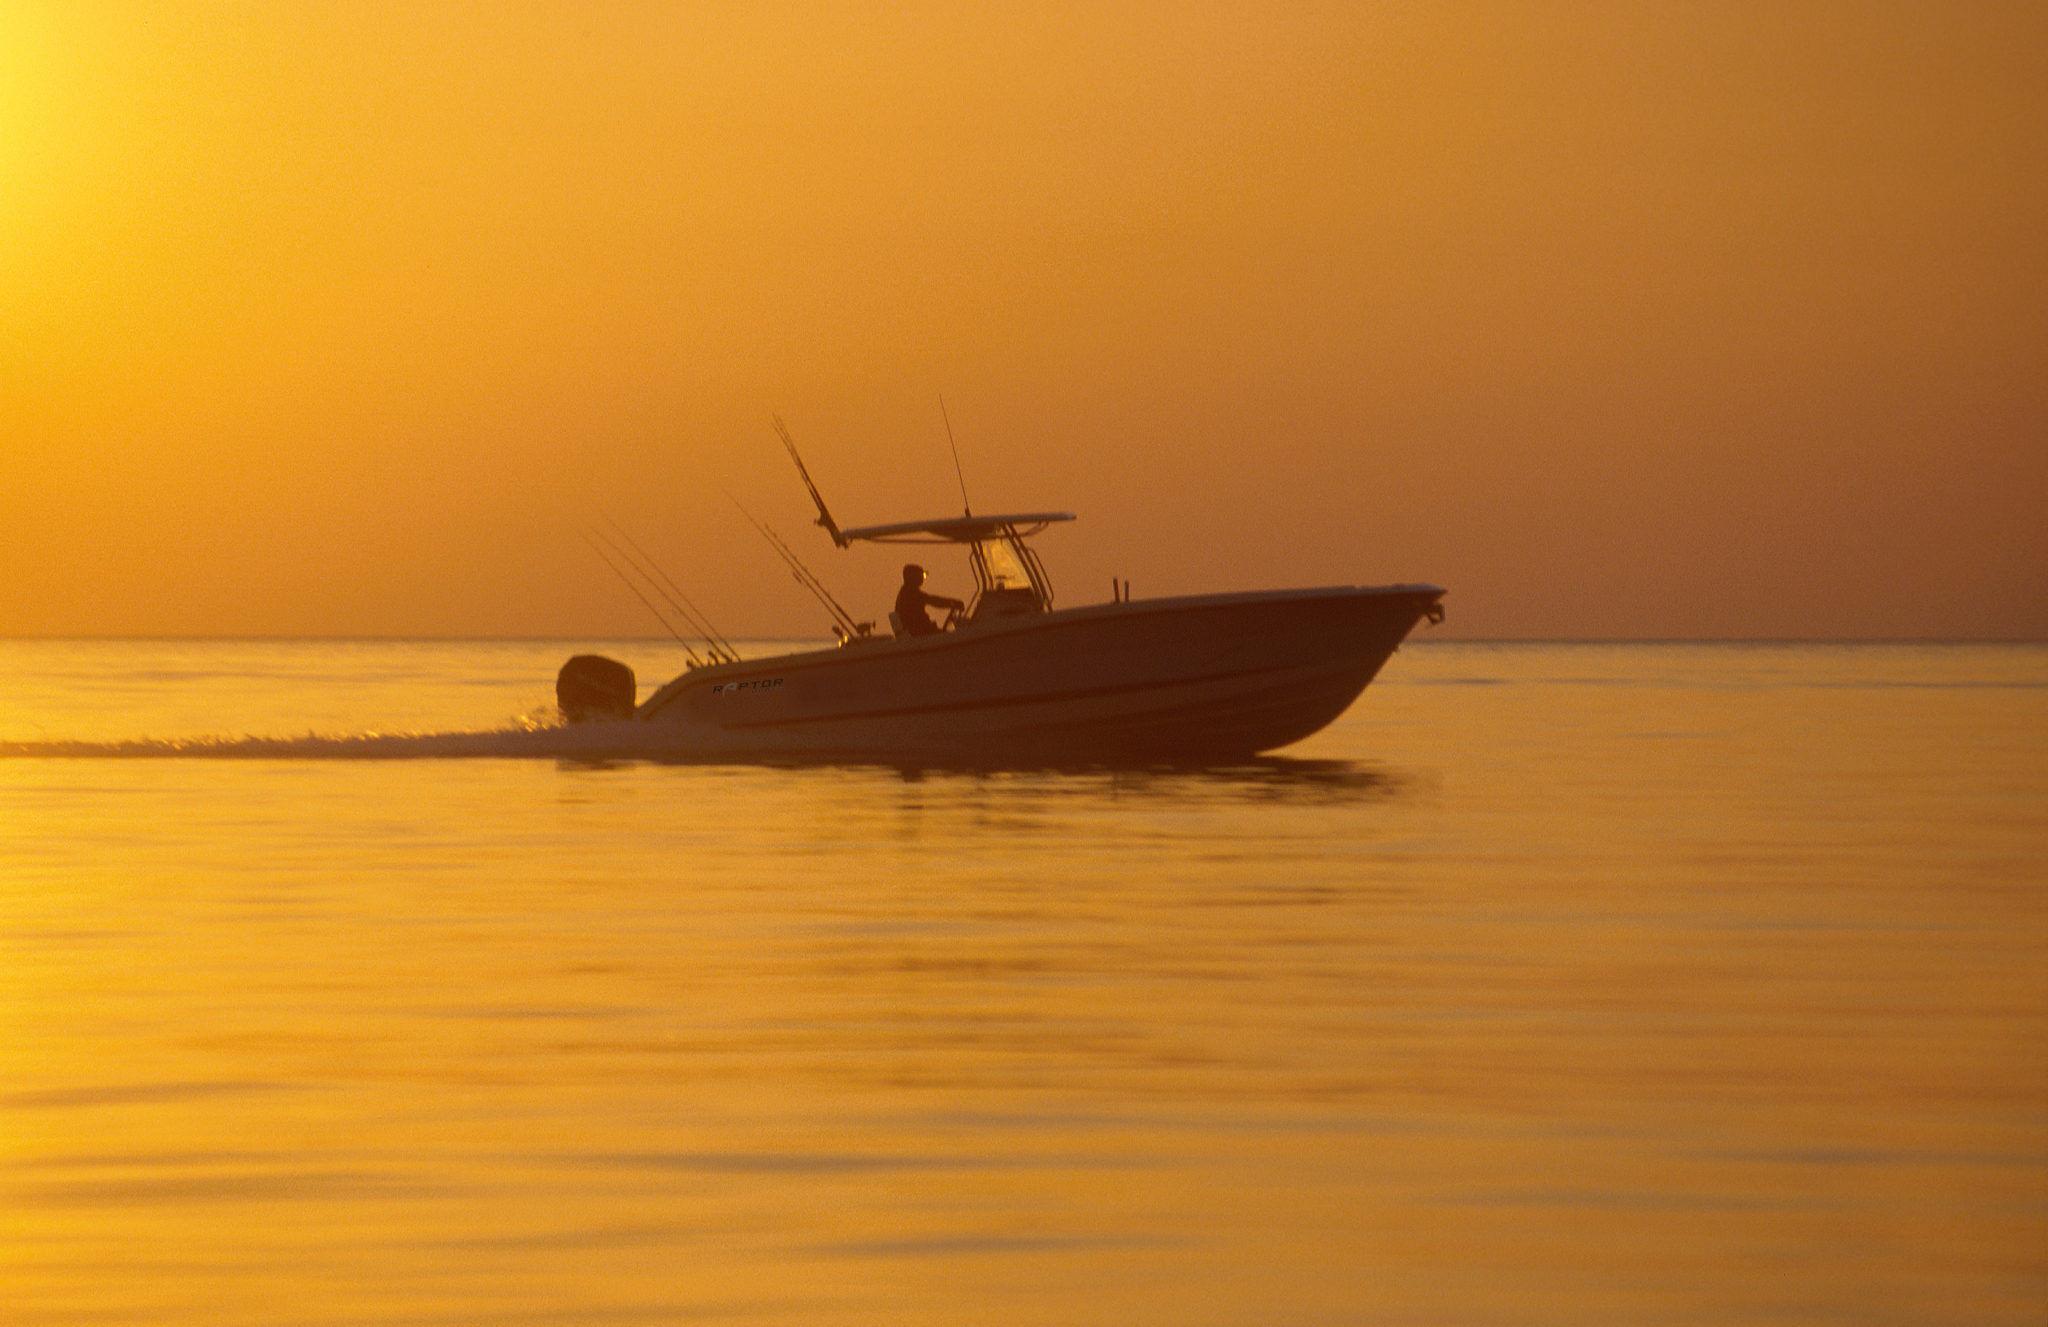 MG39 corse fishing32 03a